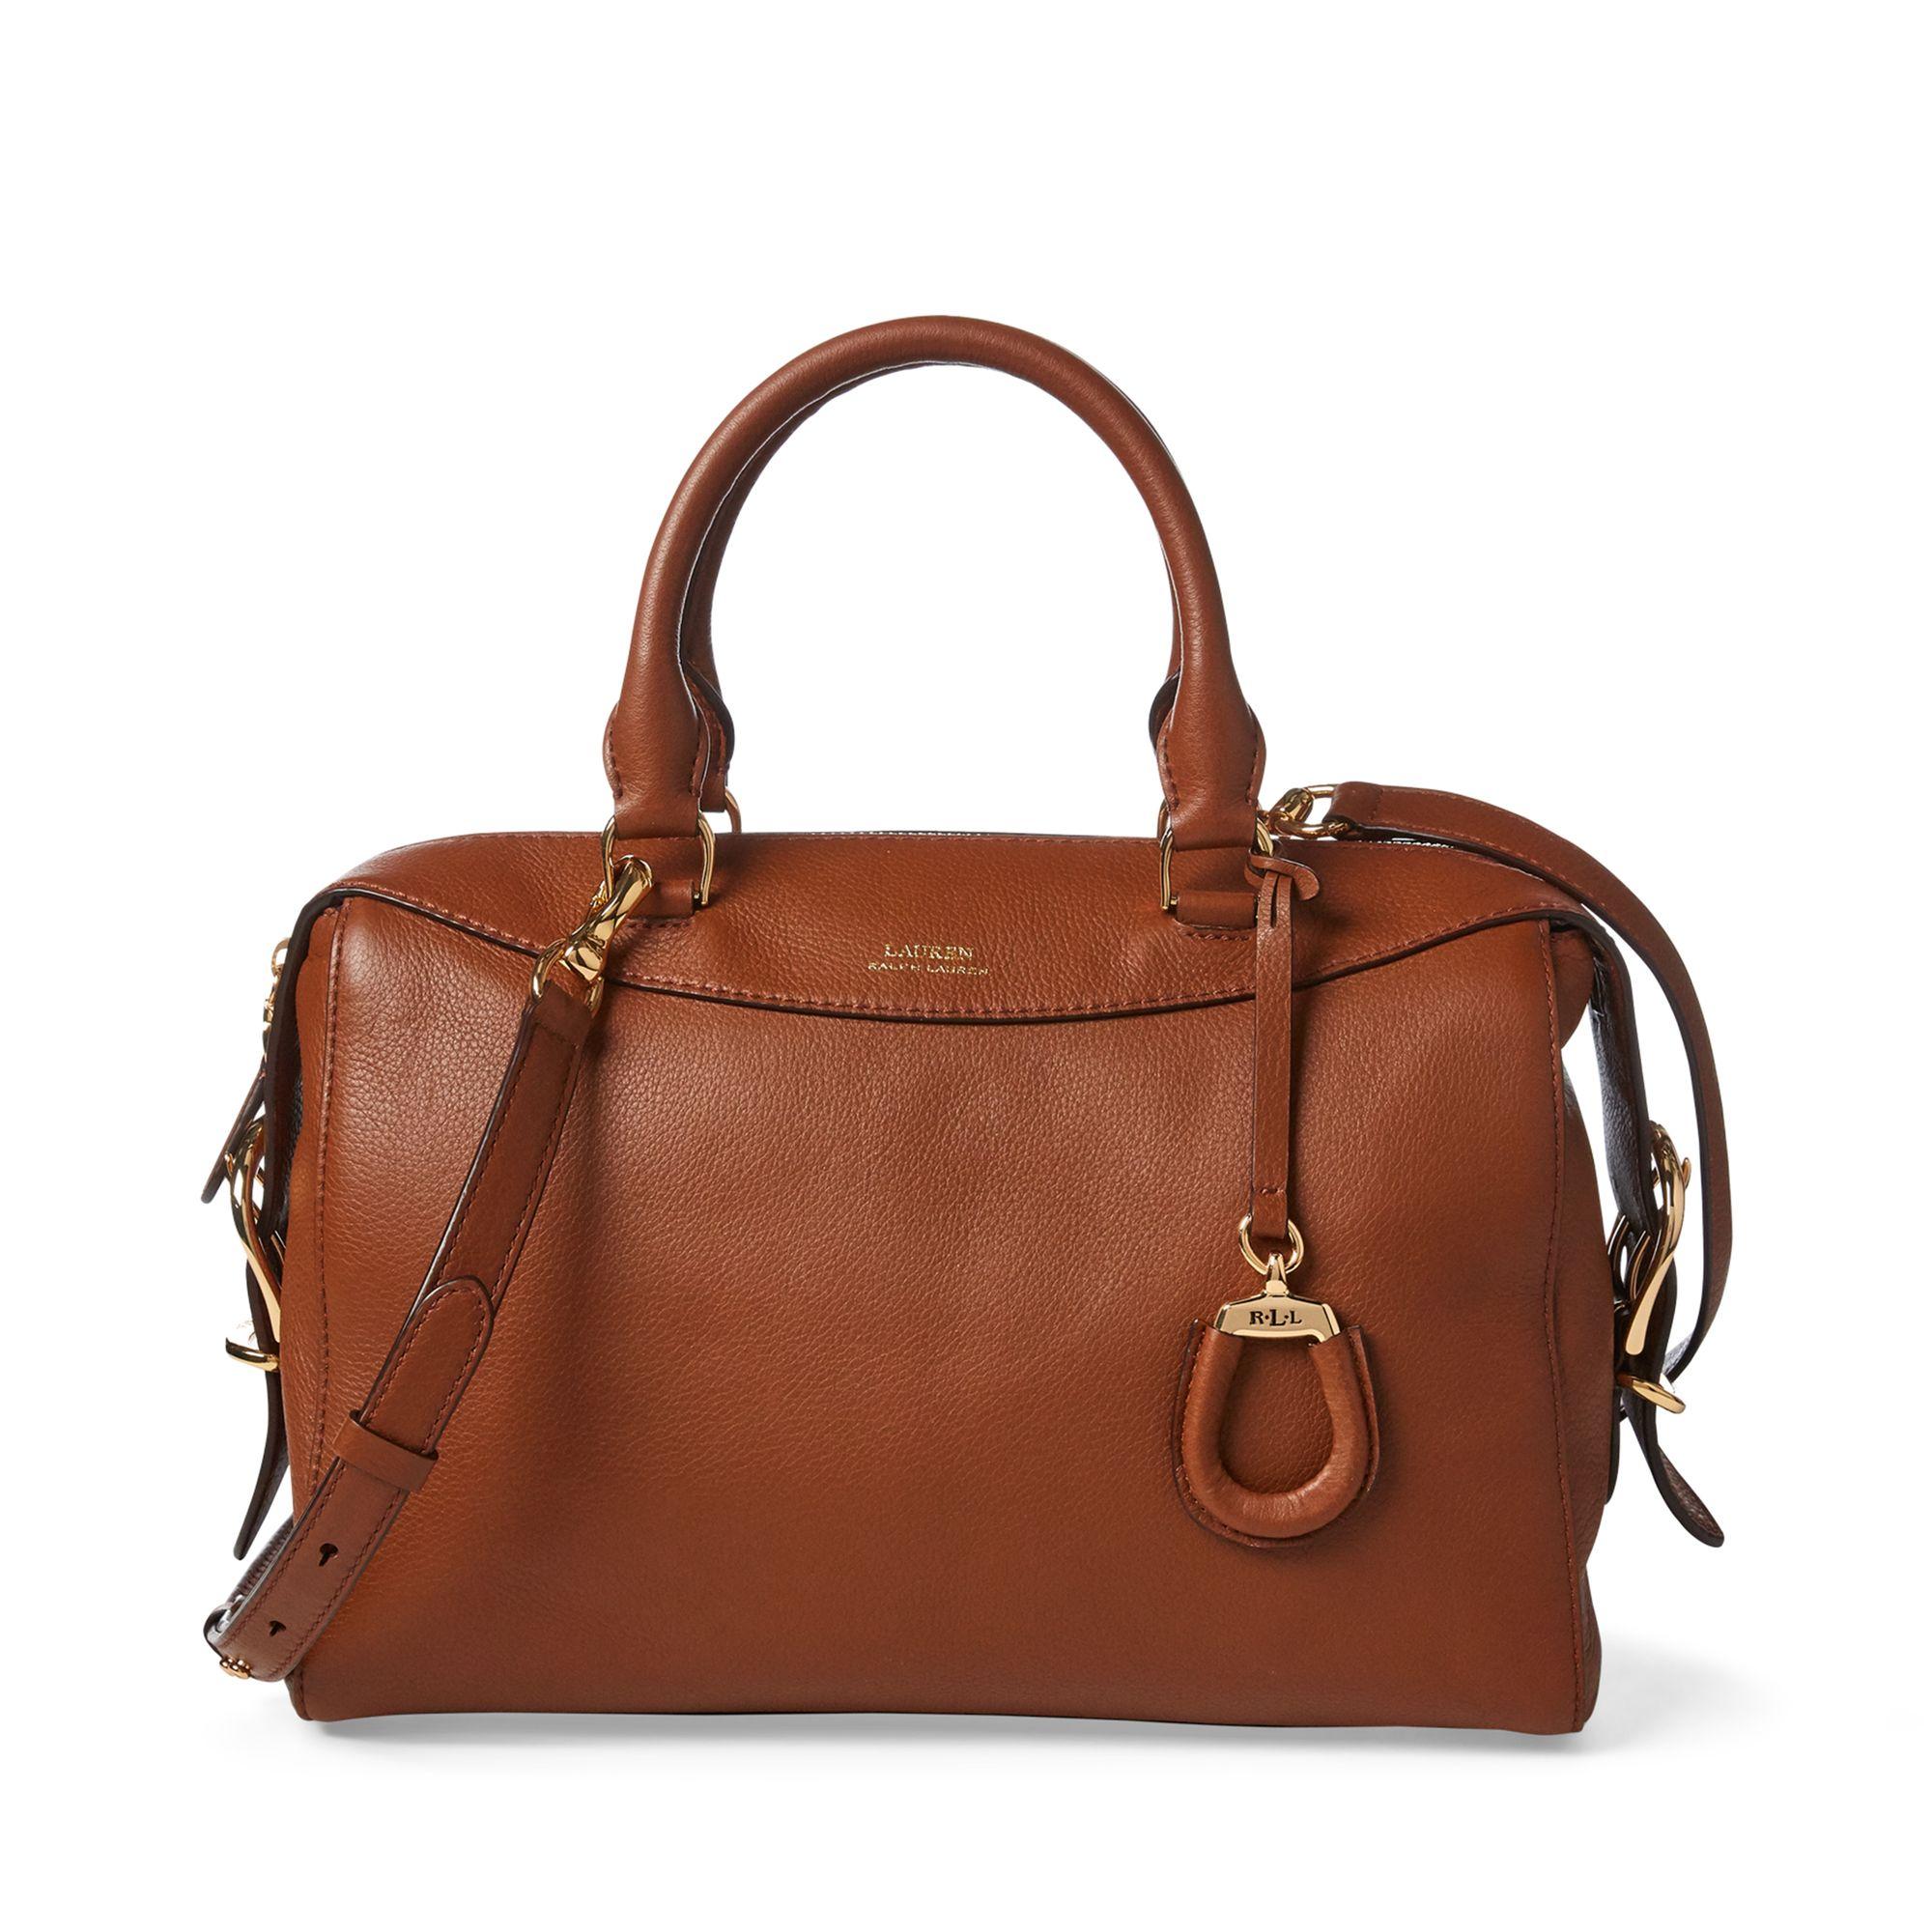 Lauren Ralph Lauren Cornwall handväska i skinn, Cognac